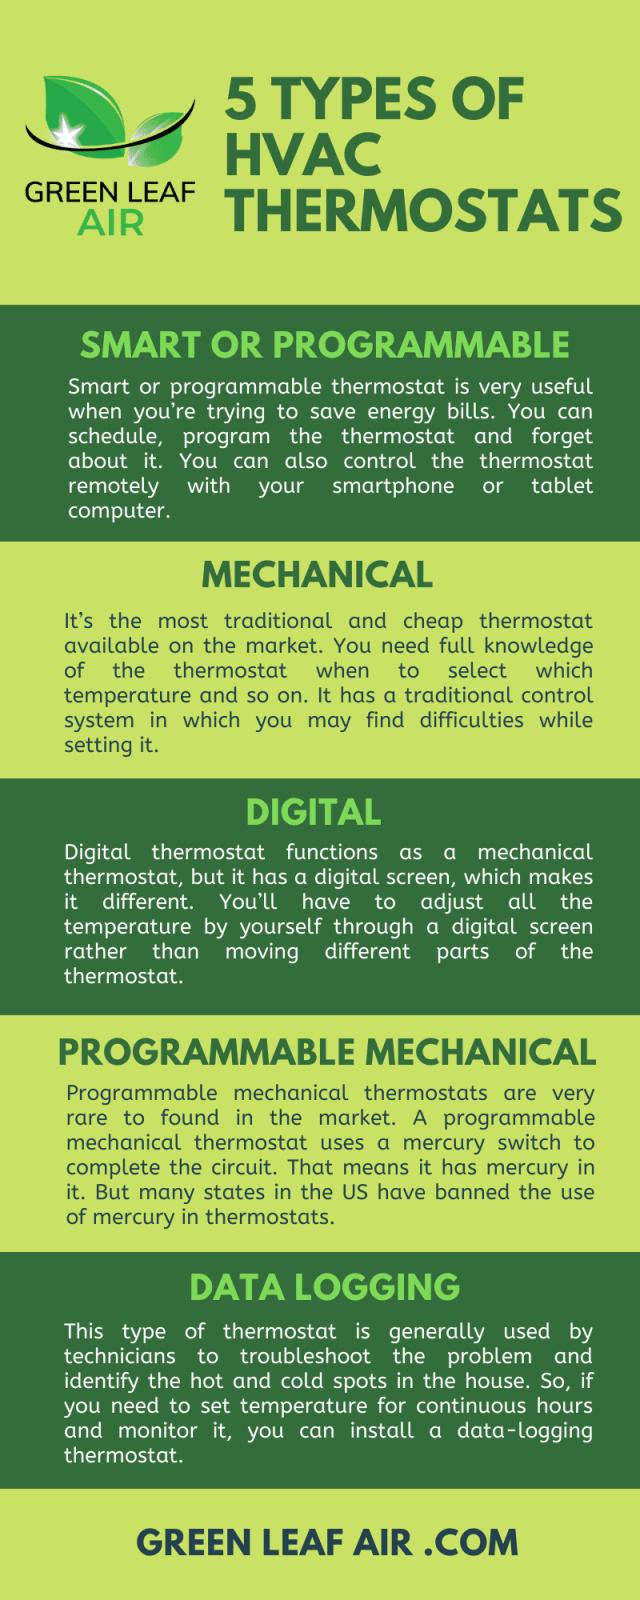 5 Types of HVAC Thermostats